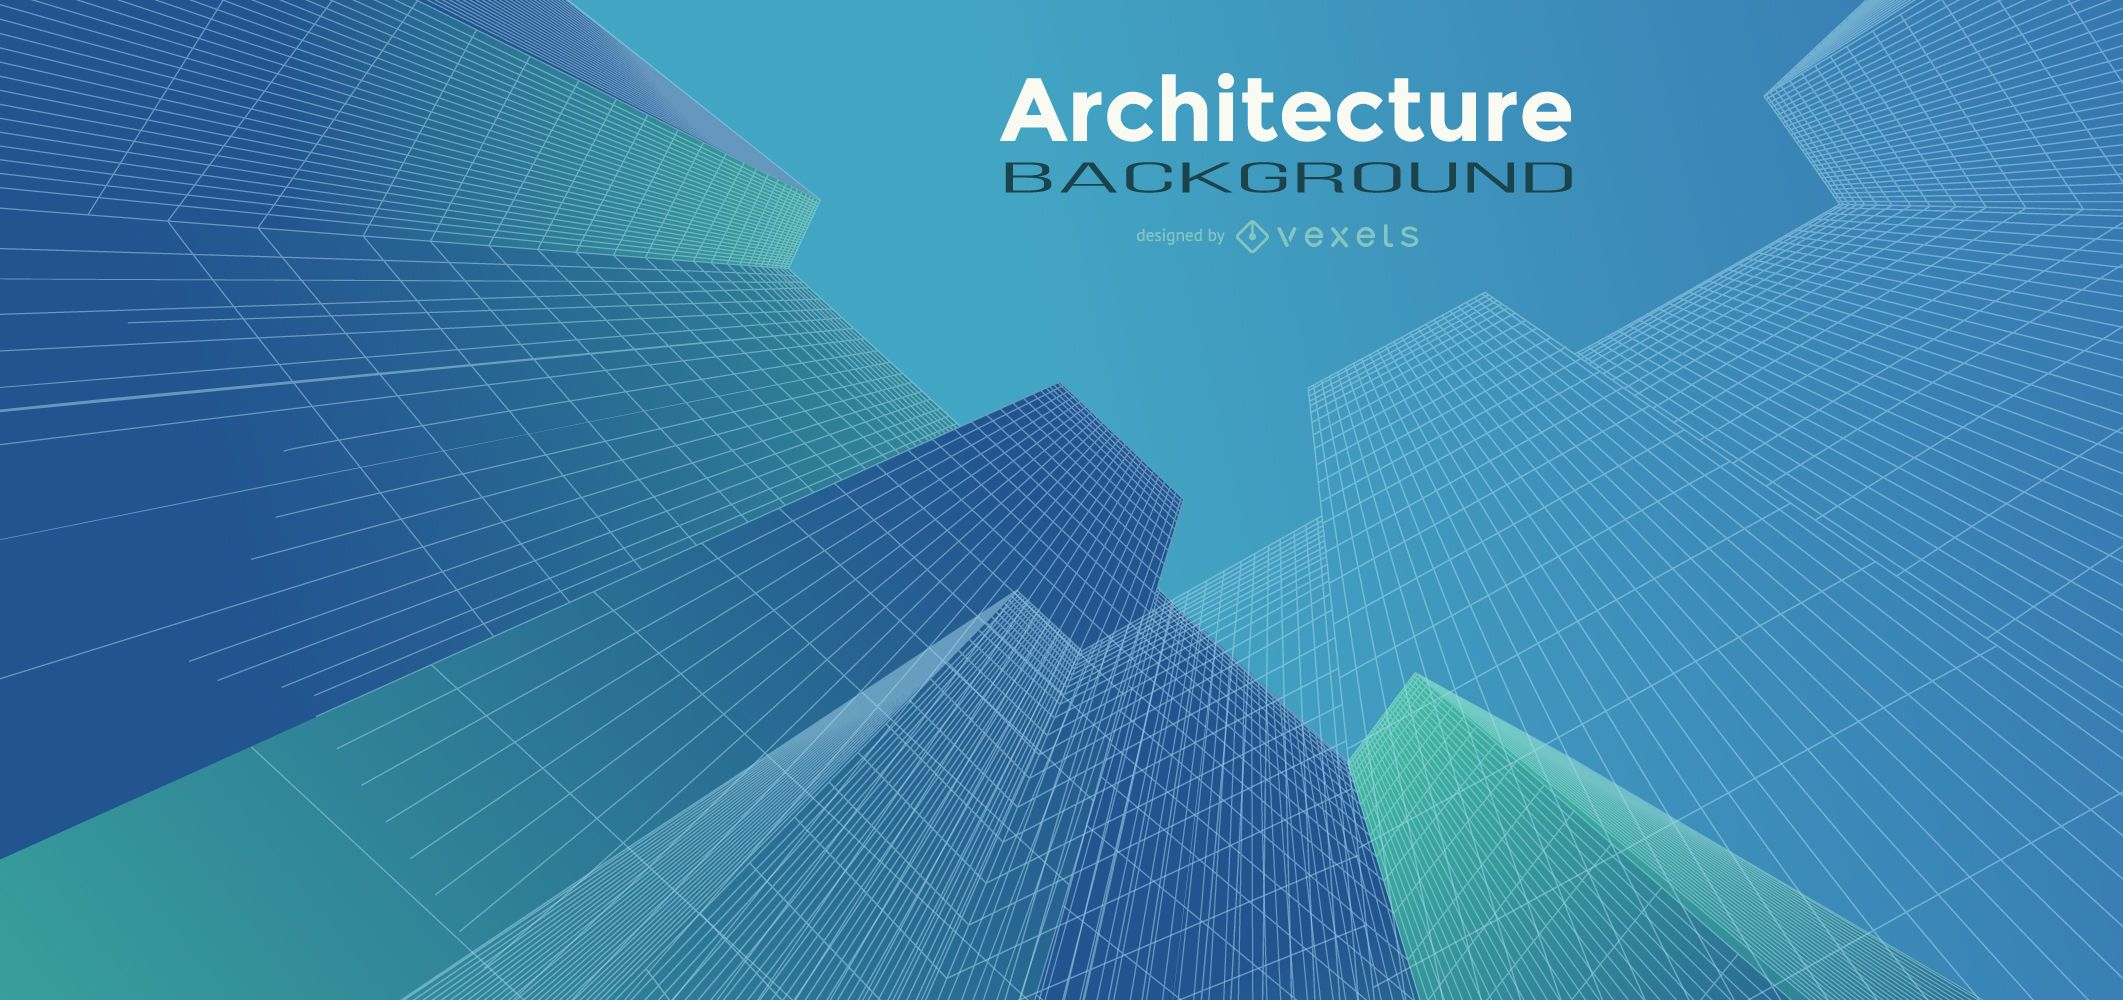 Architecture gradient background design